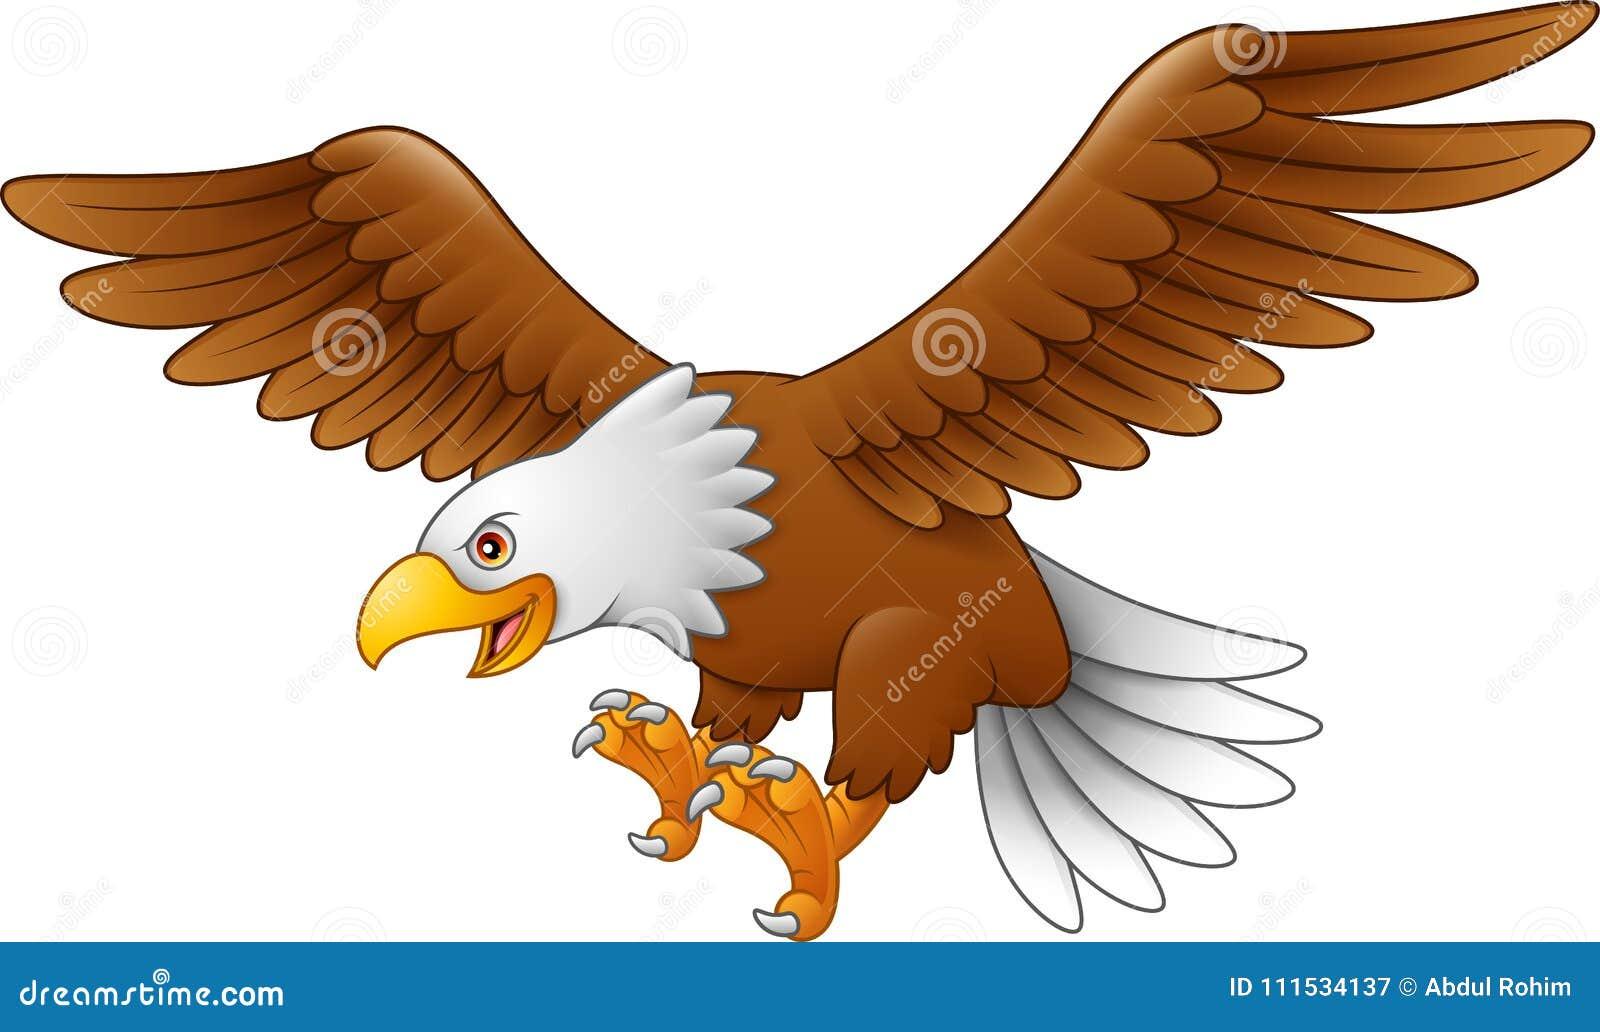 Cartoon Eagle Flying Stock Illustrations 963 Cartoon Eagle